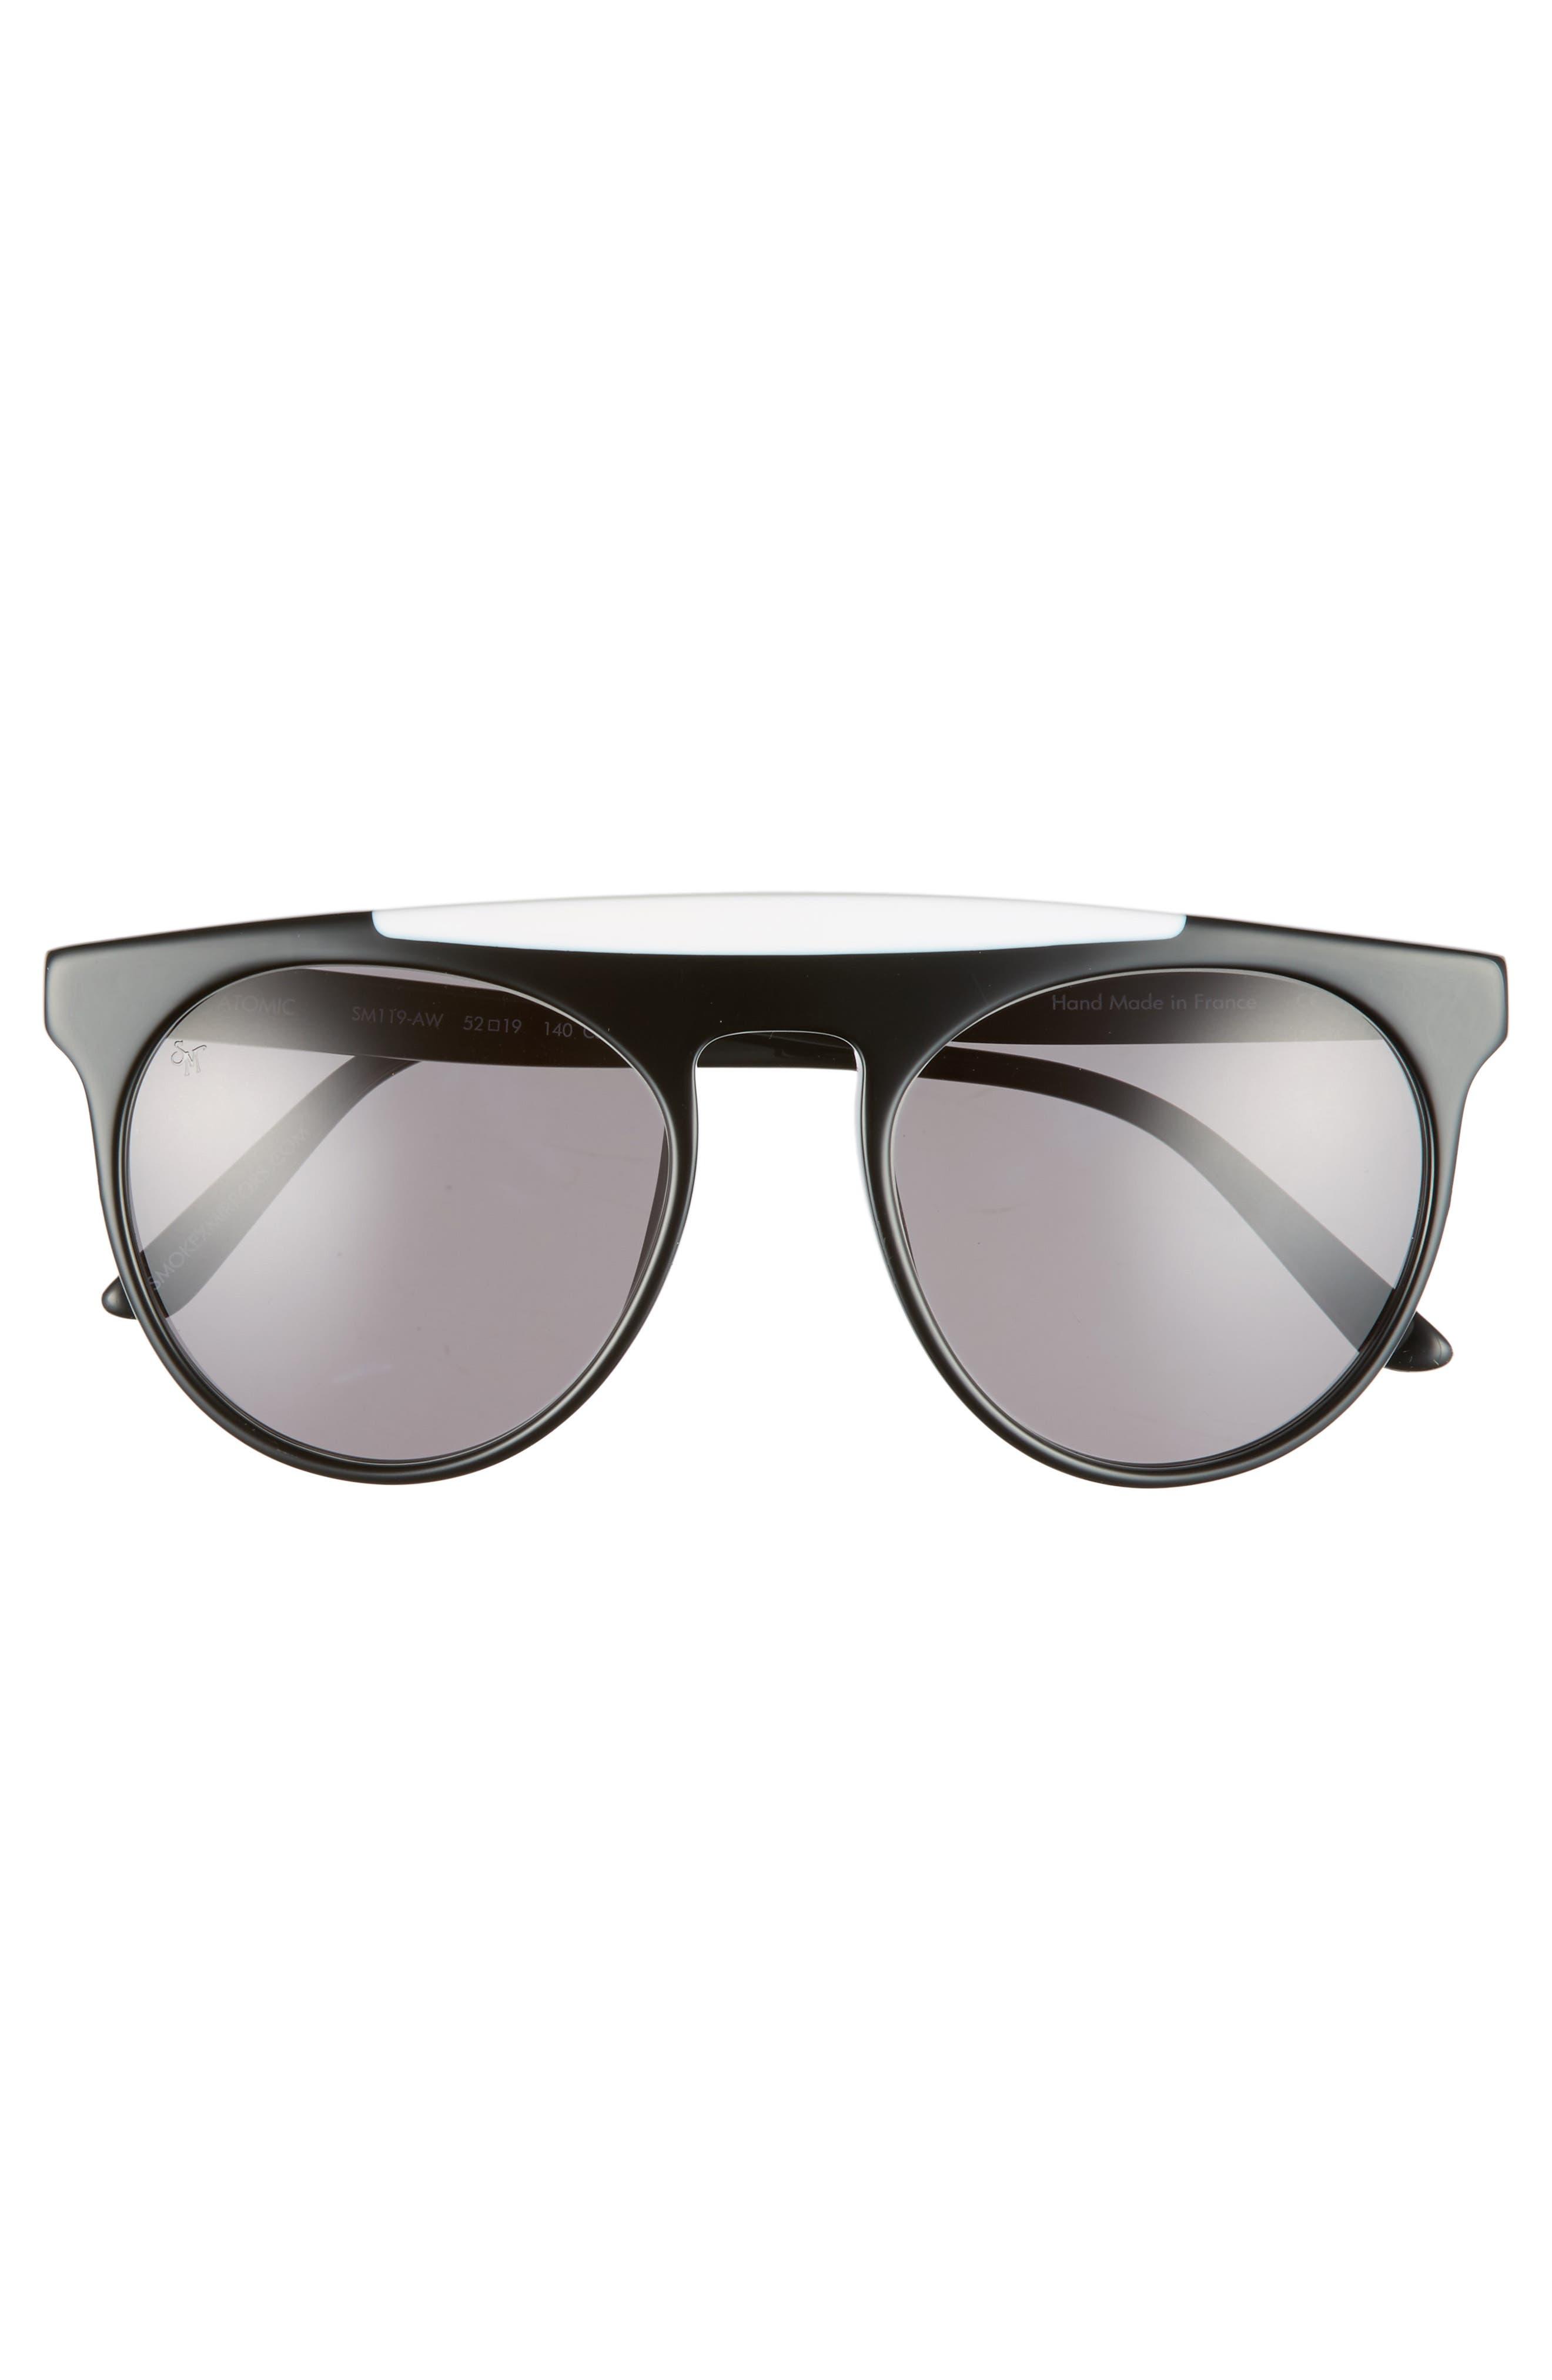 Atomic 52mm Sunglasses,                             Alternate thumbnail 2, color,                             001